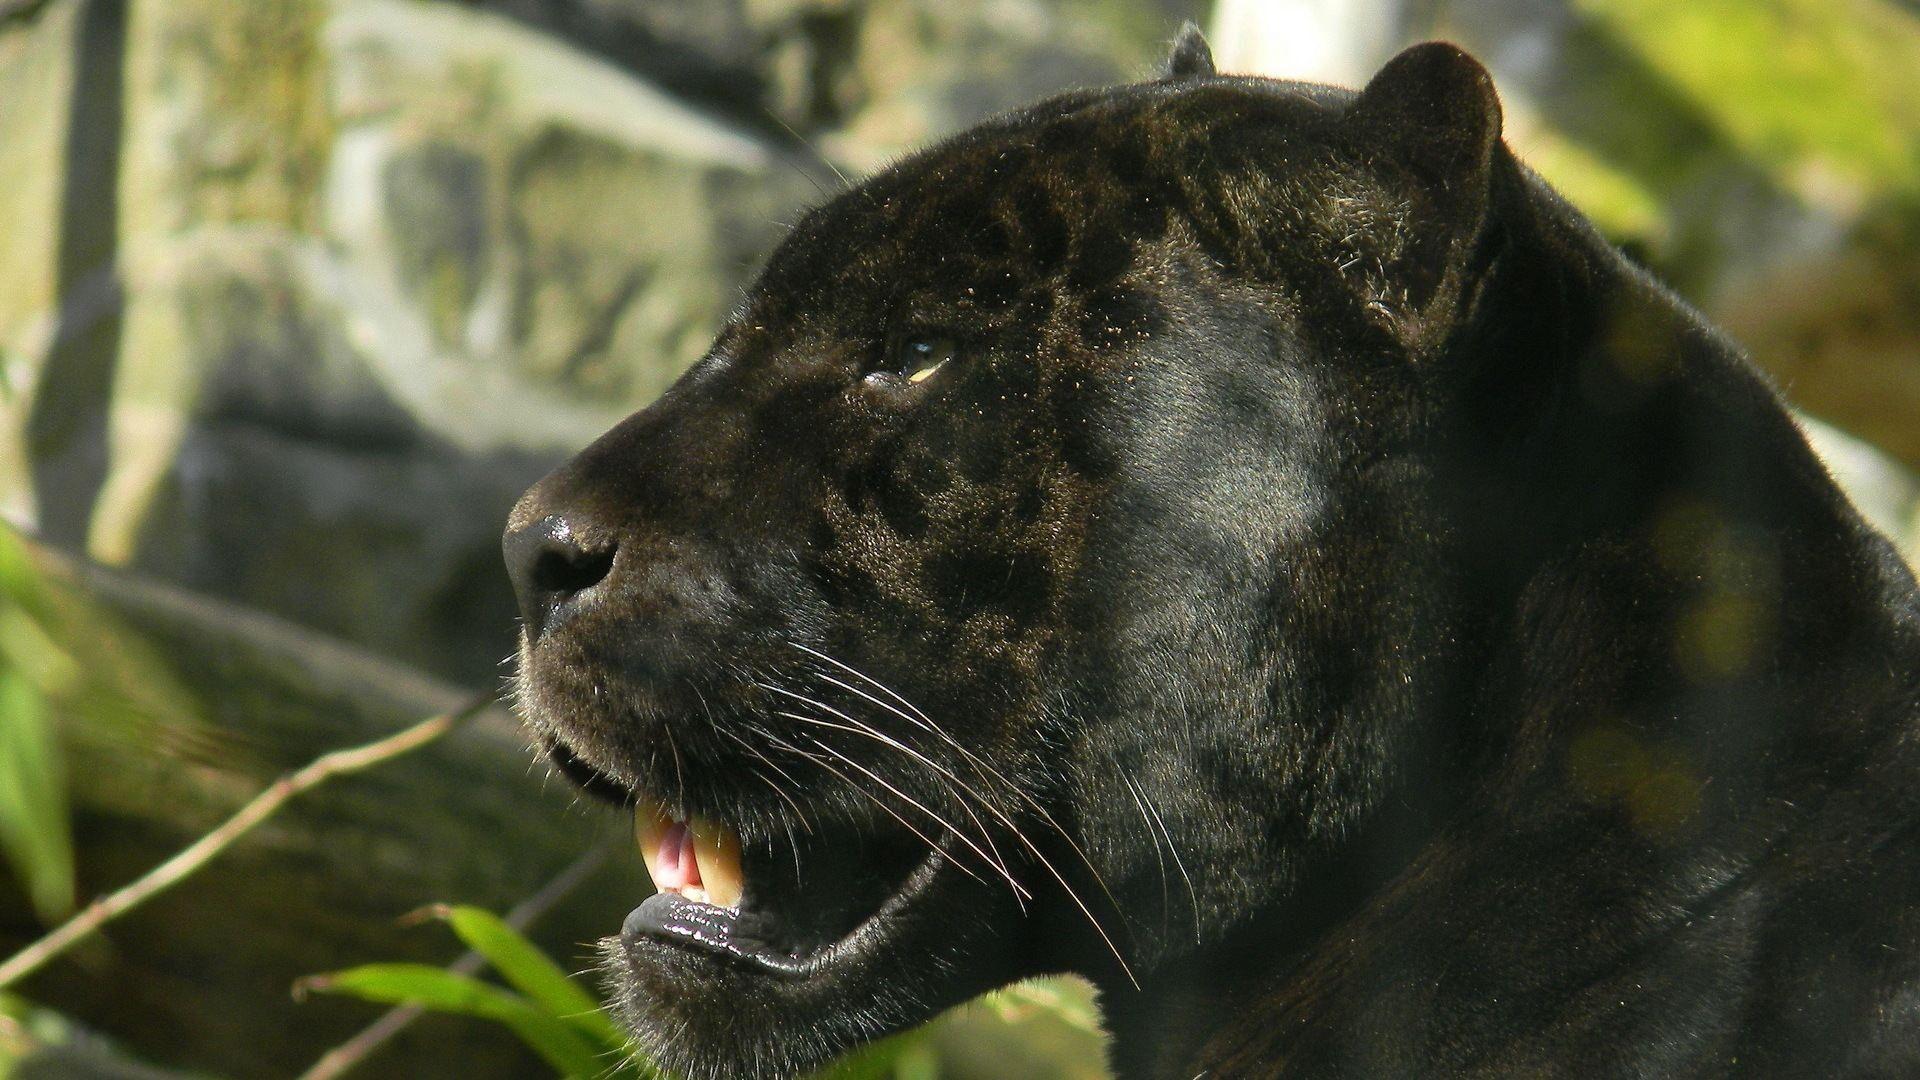 Panther Full Hd Desktop Wallpapers 1080p Panther Black Panther Animals